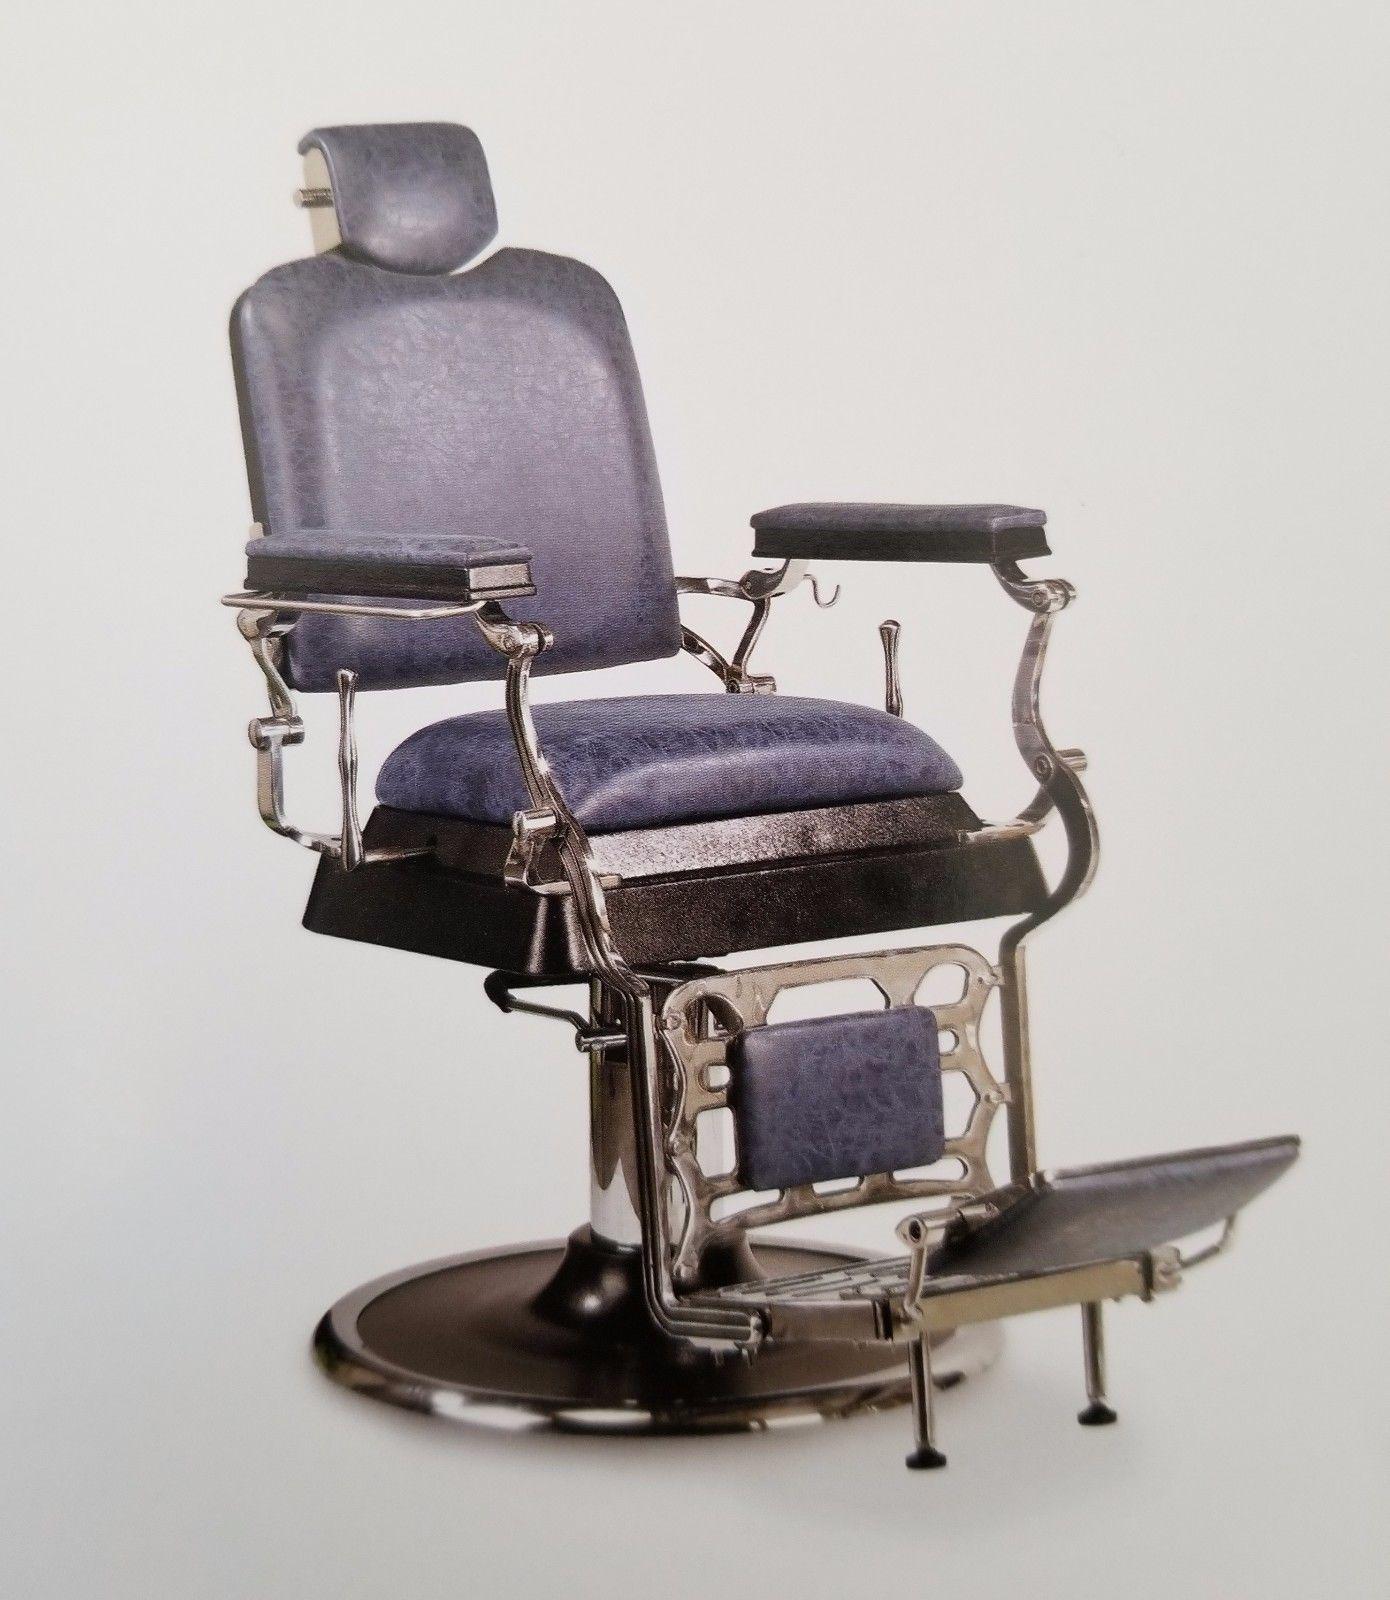 all purpose salon chairs reclining broda chair indications daenerys heavy duty hydraulic barber